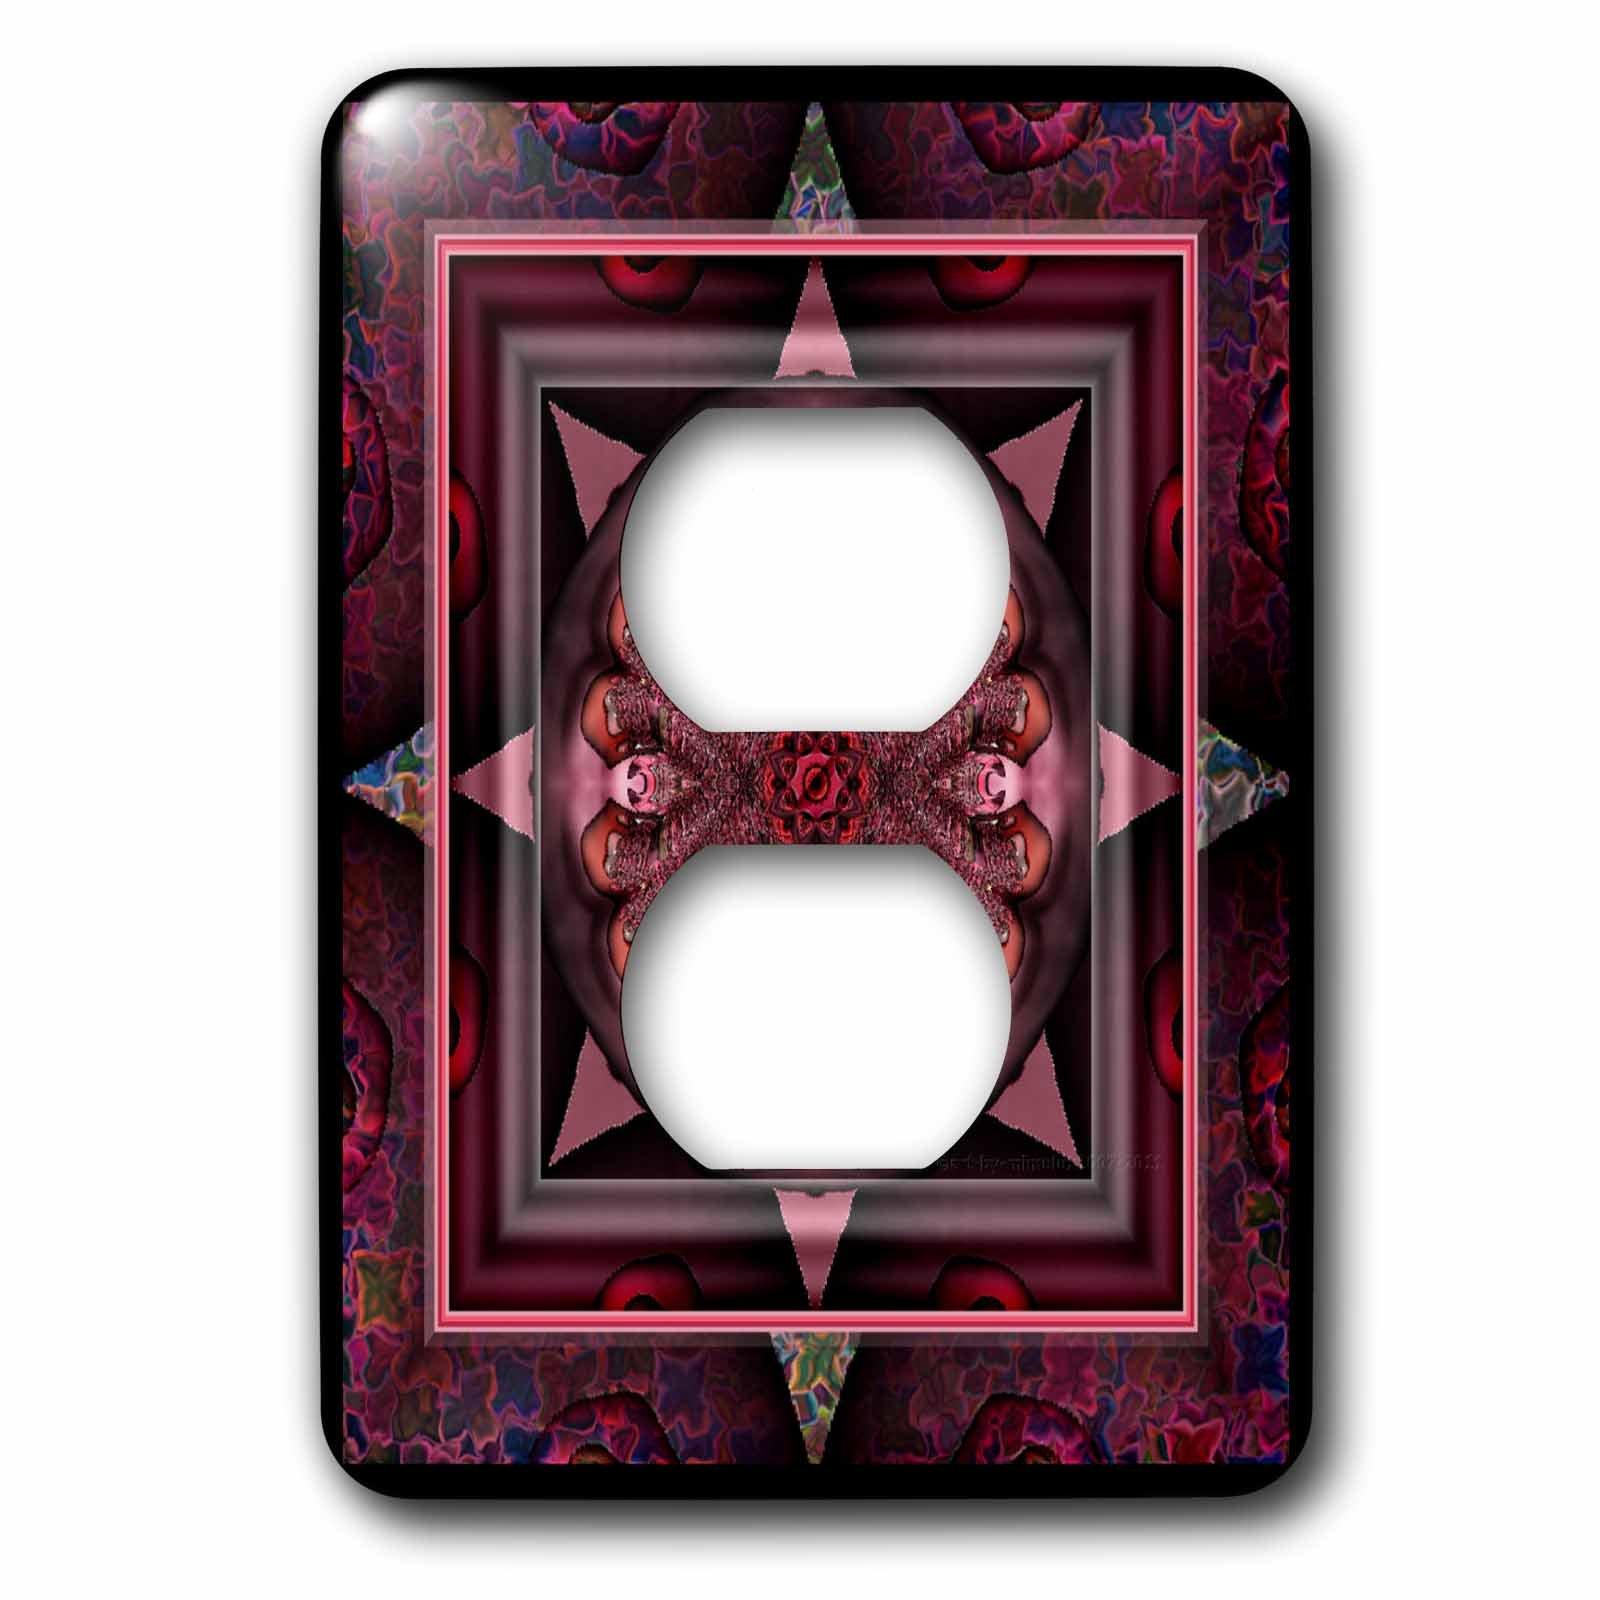 3dRose lsp_24842_6 Mandala 10 Chakra Purple Pink Black Flowerpower Hippie India Orient Oriental Meditate Peace Harmony 2-Plug Outlet Cover